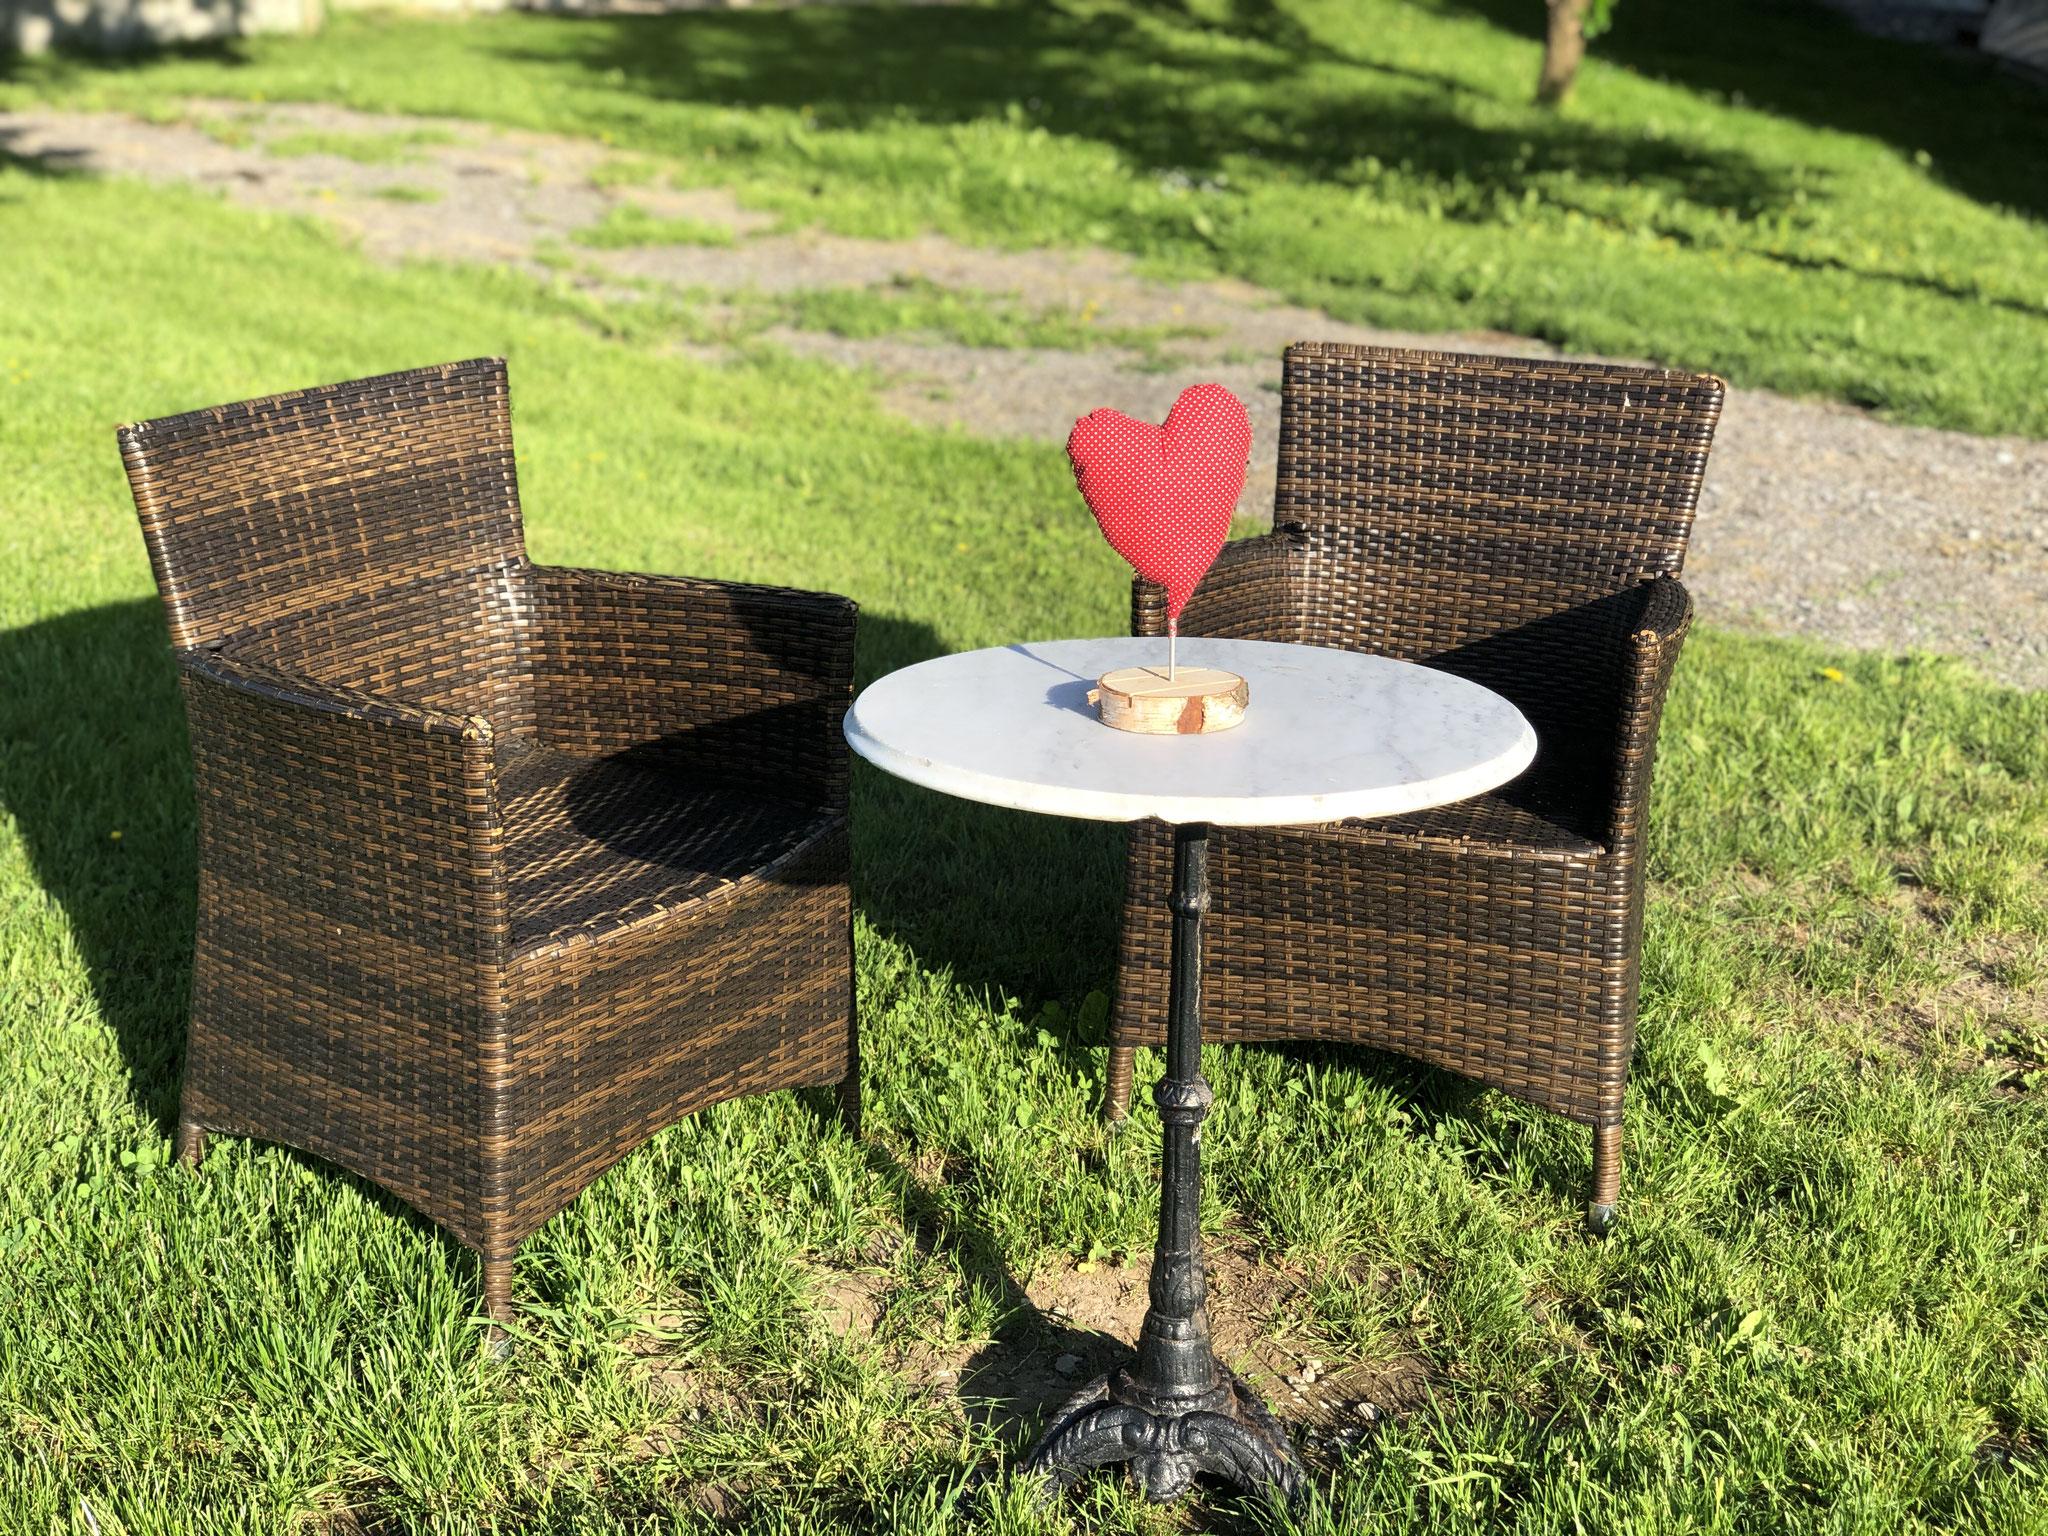 Gartenkaffee / Sitzgelegenheit